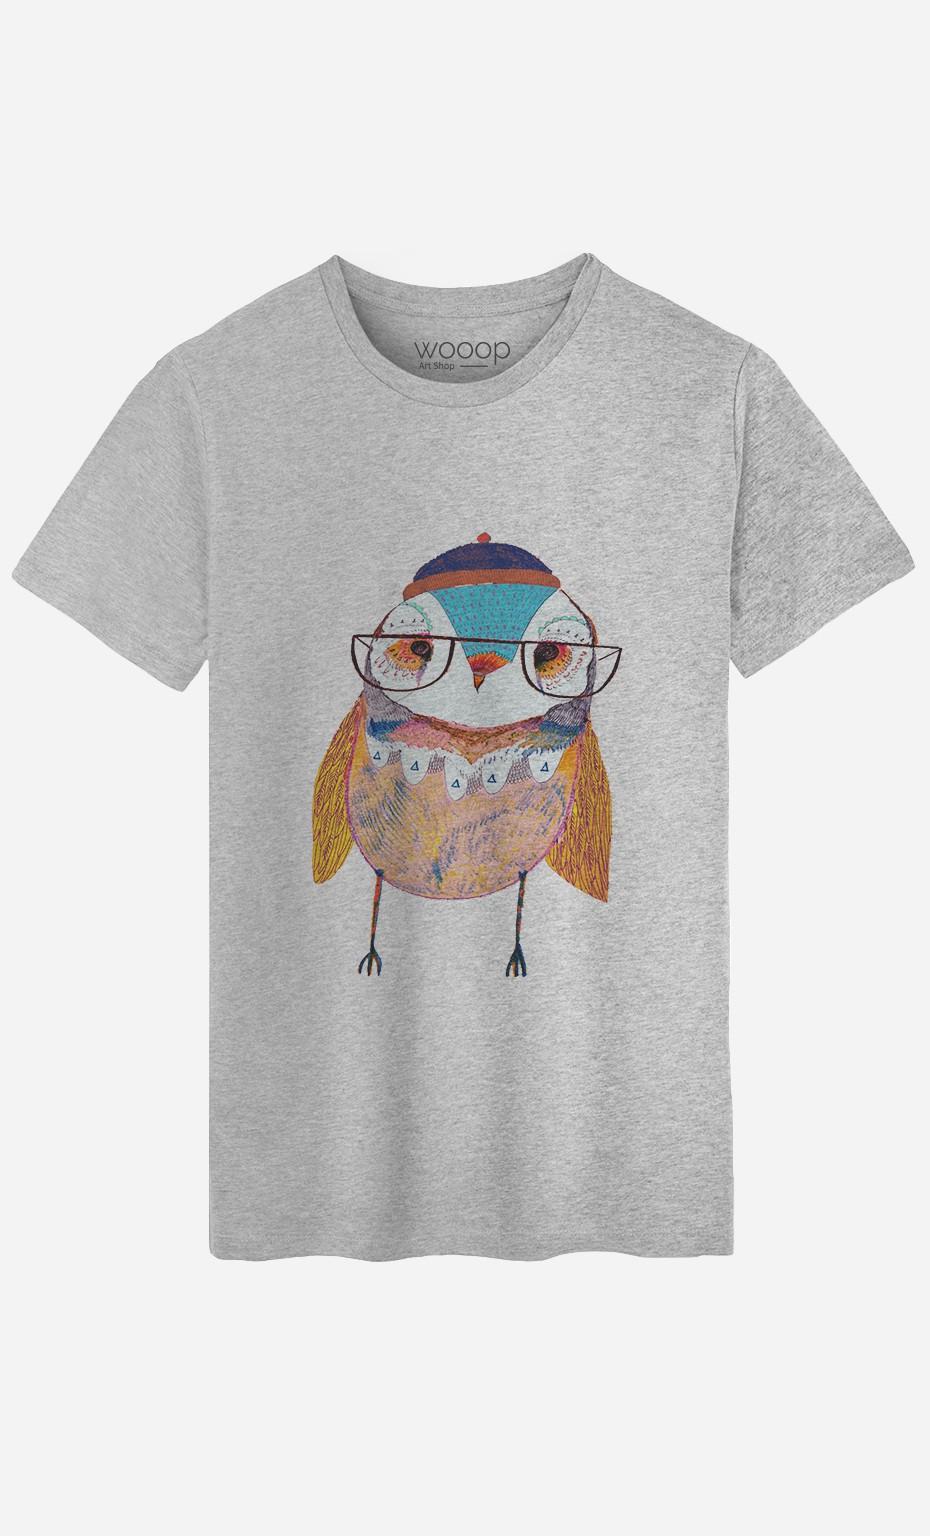 T-Shirt Homme Bobble Hat Owl